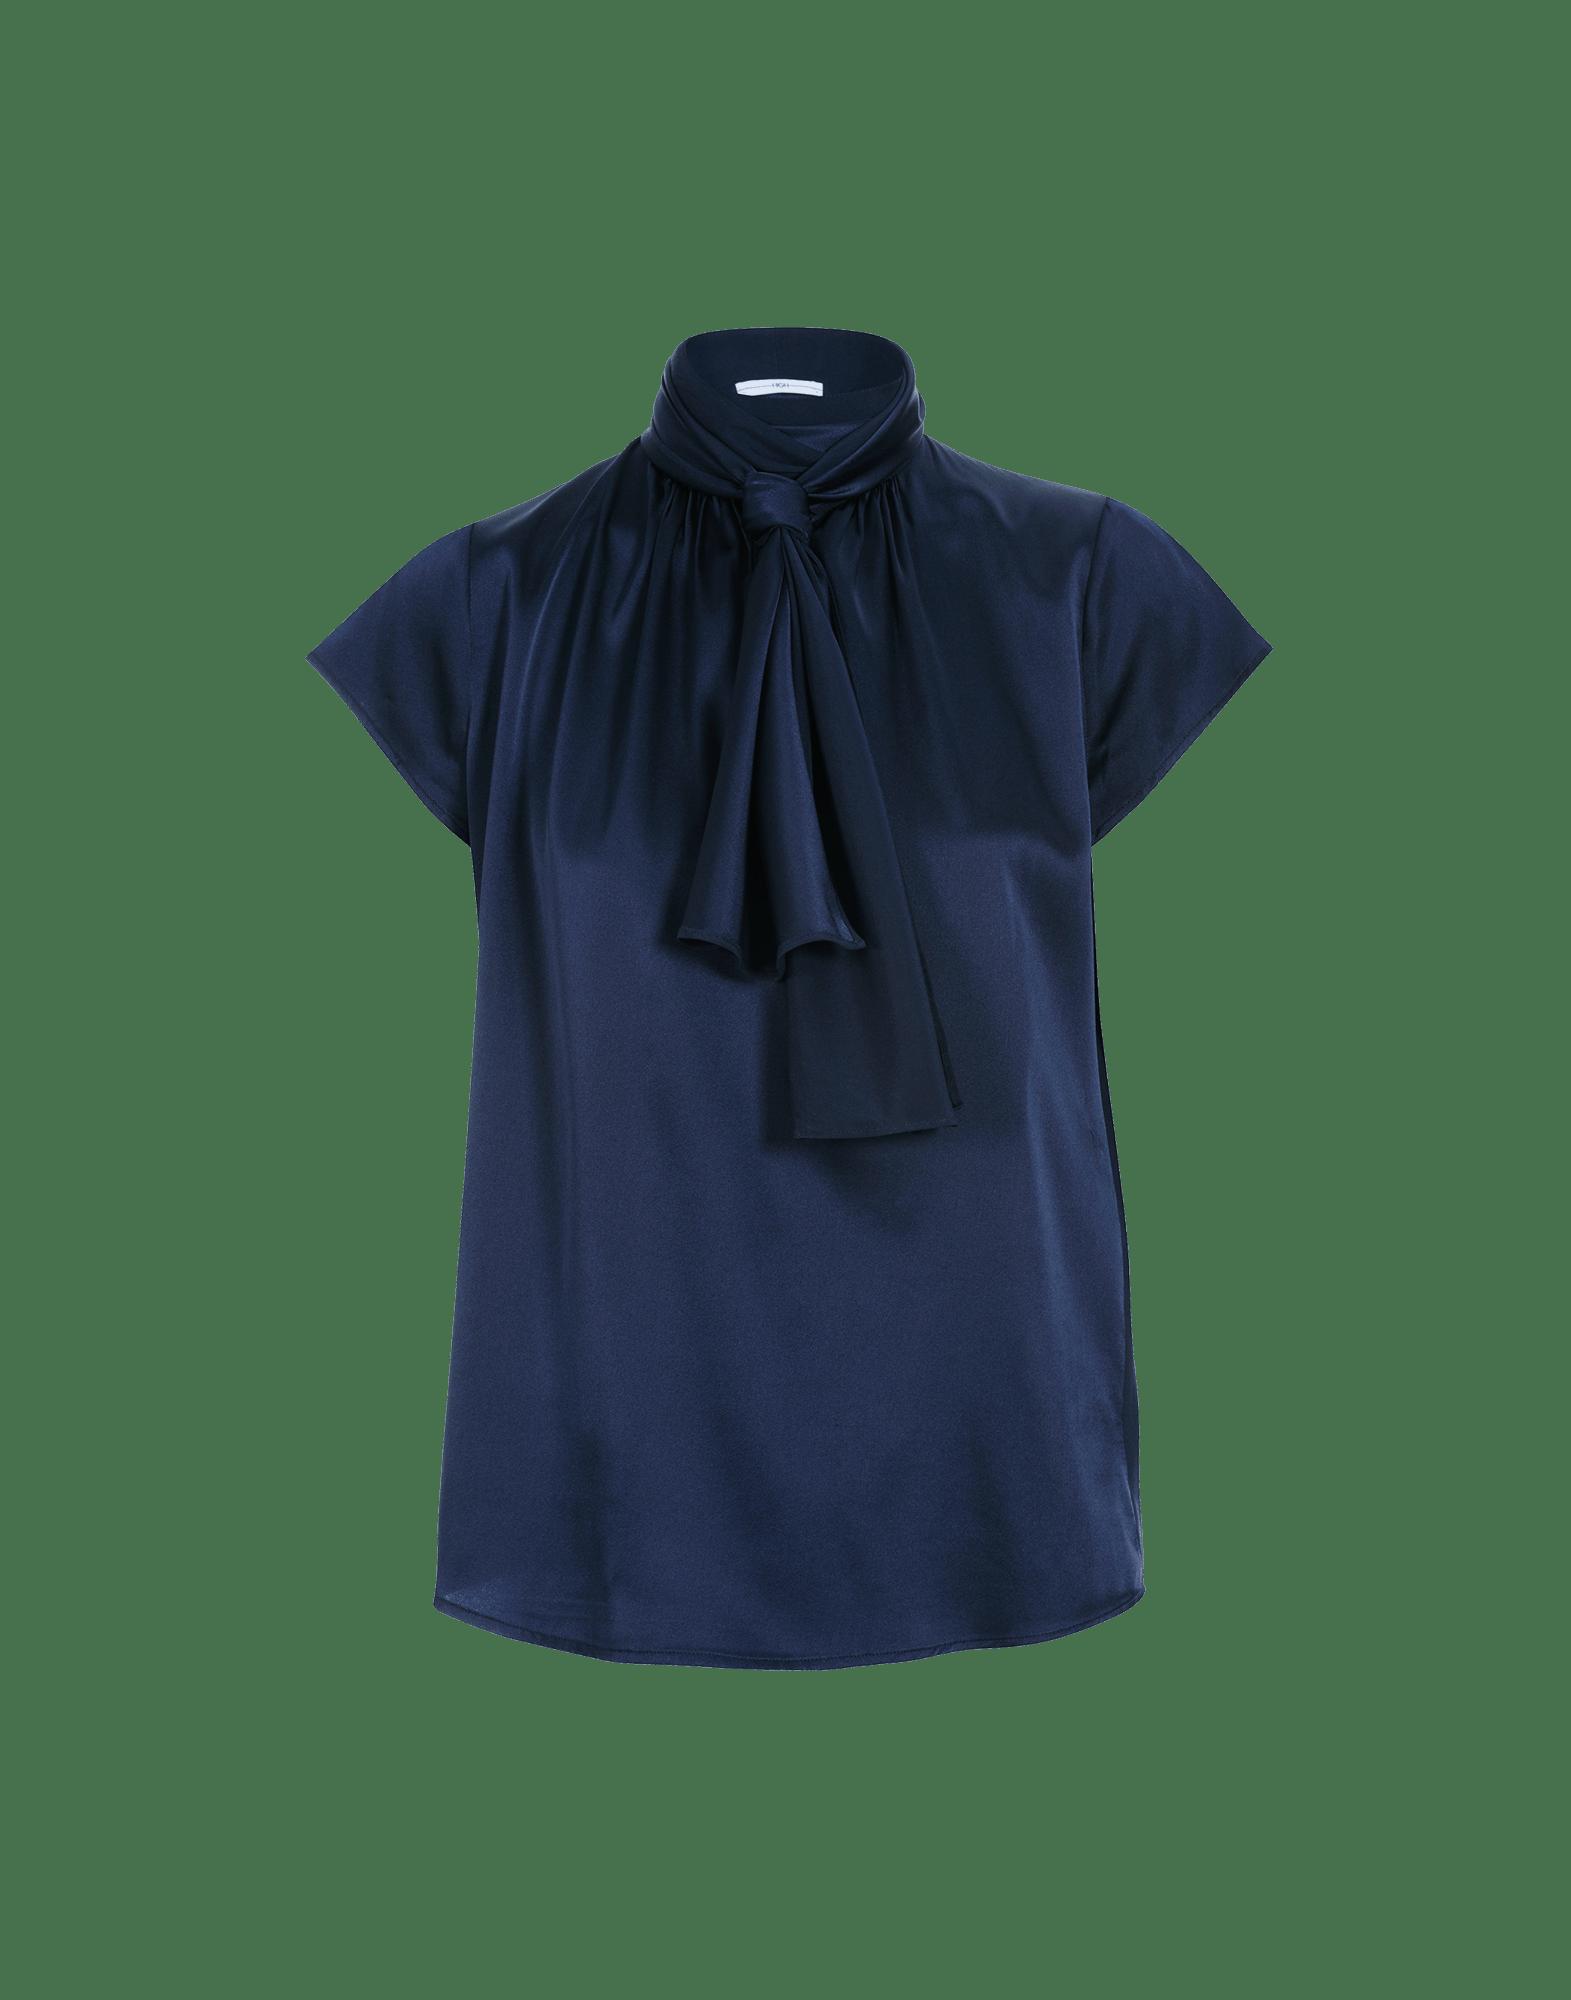 SPARK: Short sleeve top with tie collar in navy satin